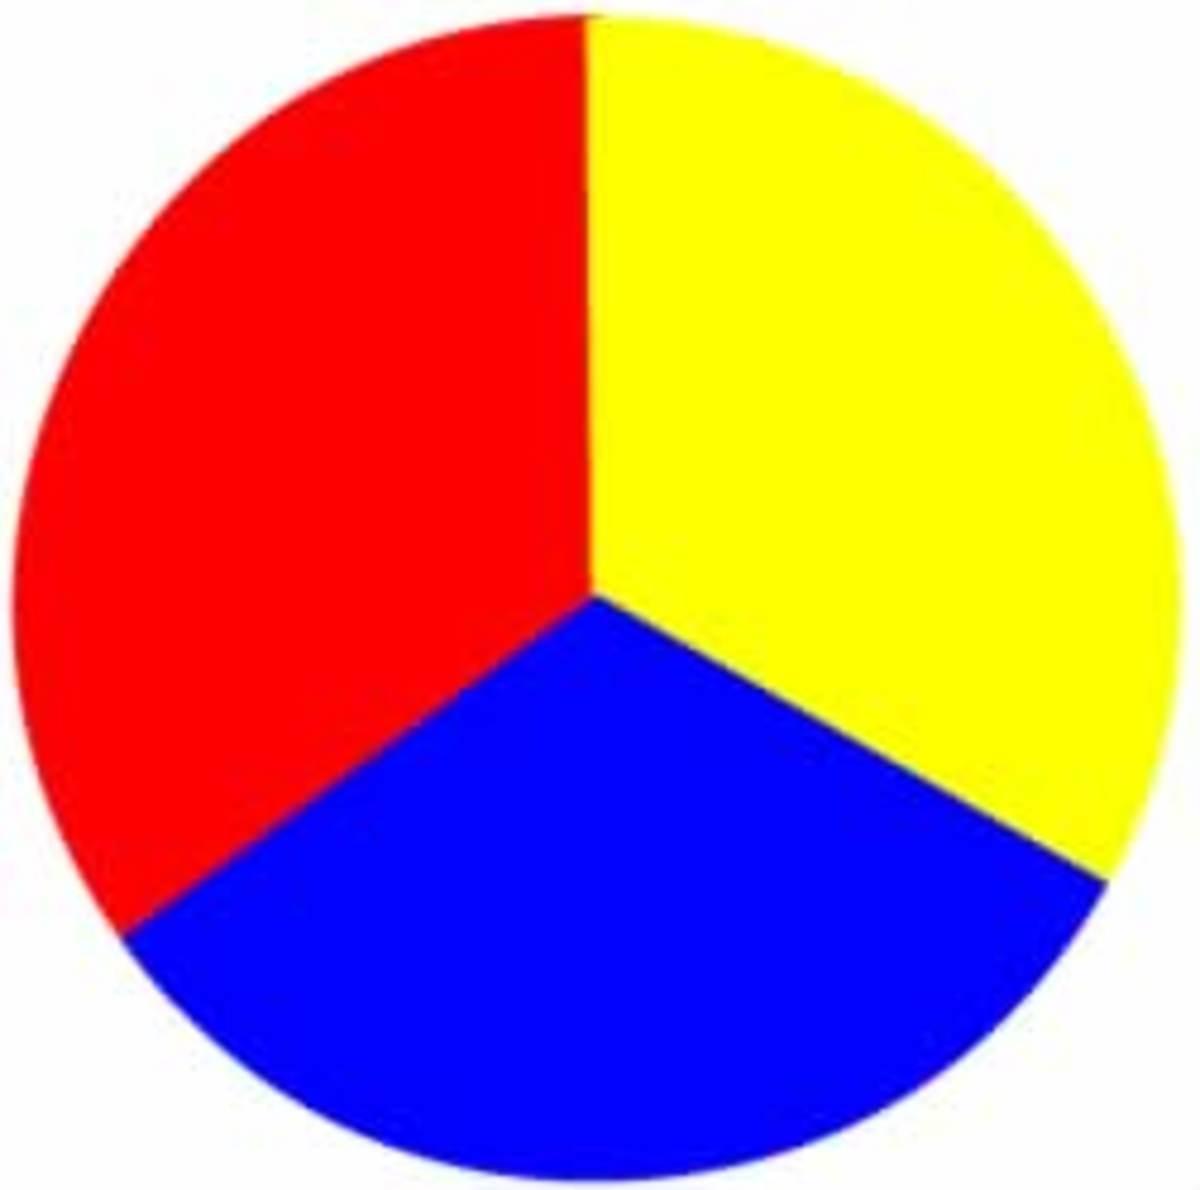 The primary colours, colour wheel.